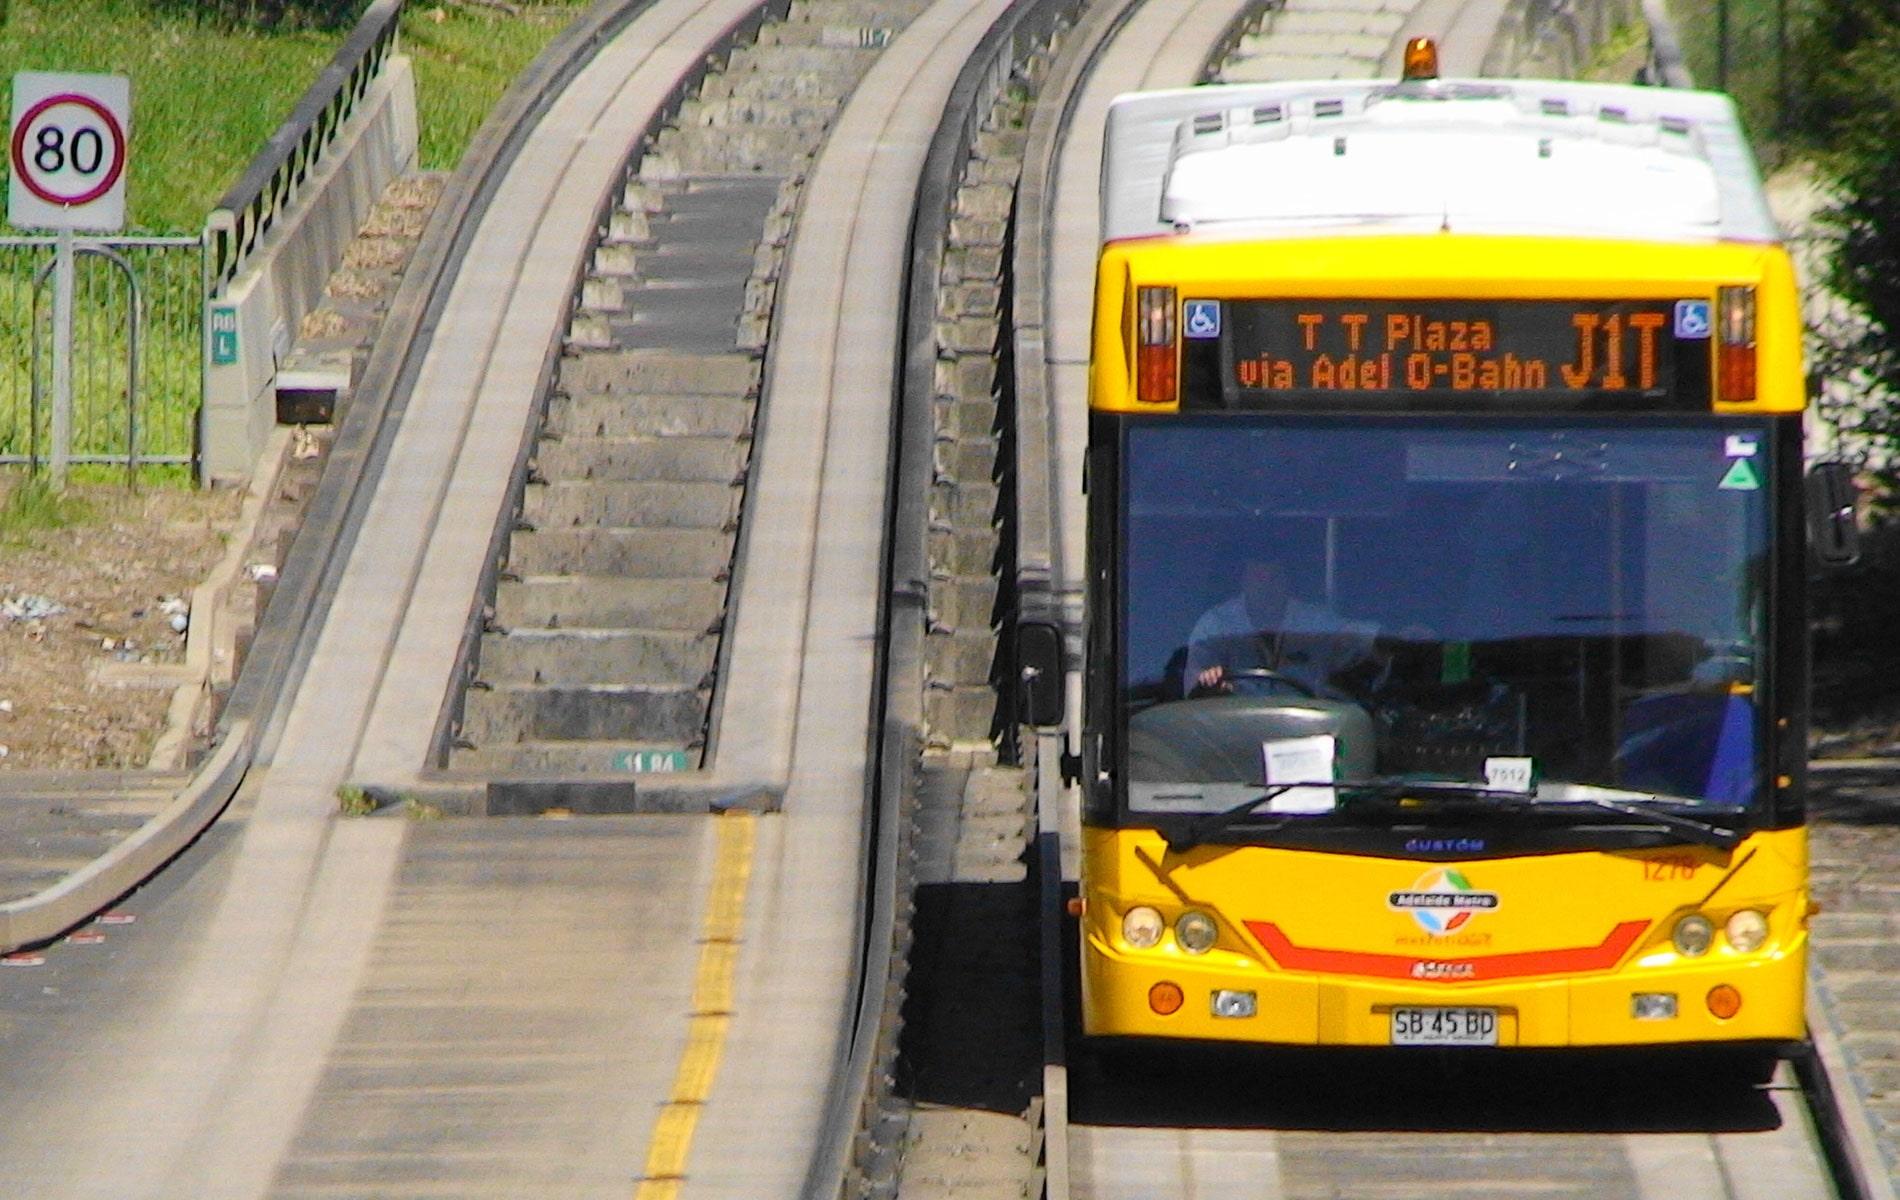 North Eastern Suburbs Adelaide   O-Bahn TTP